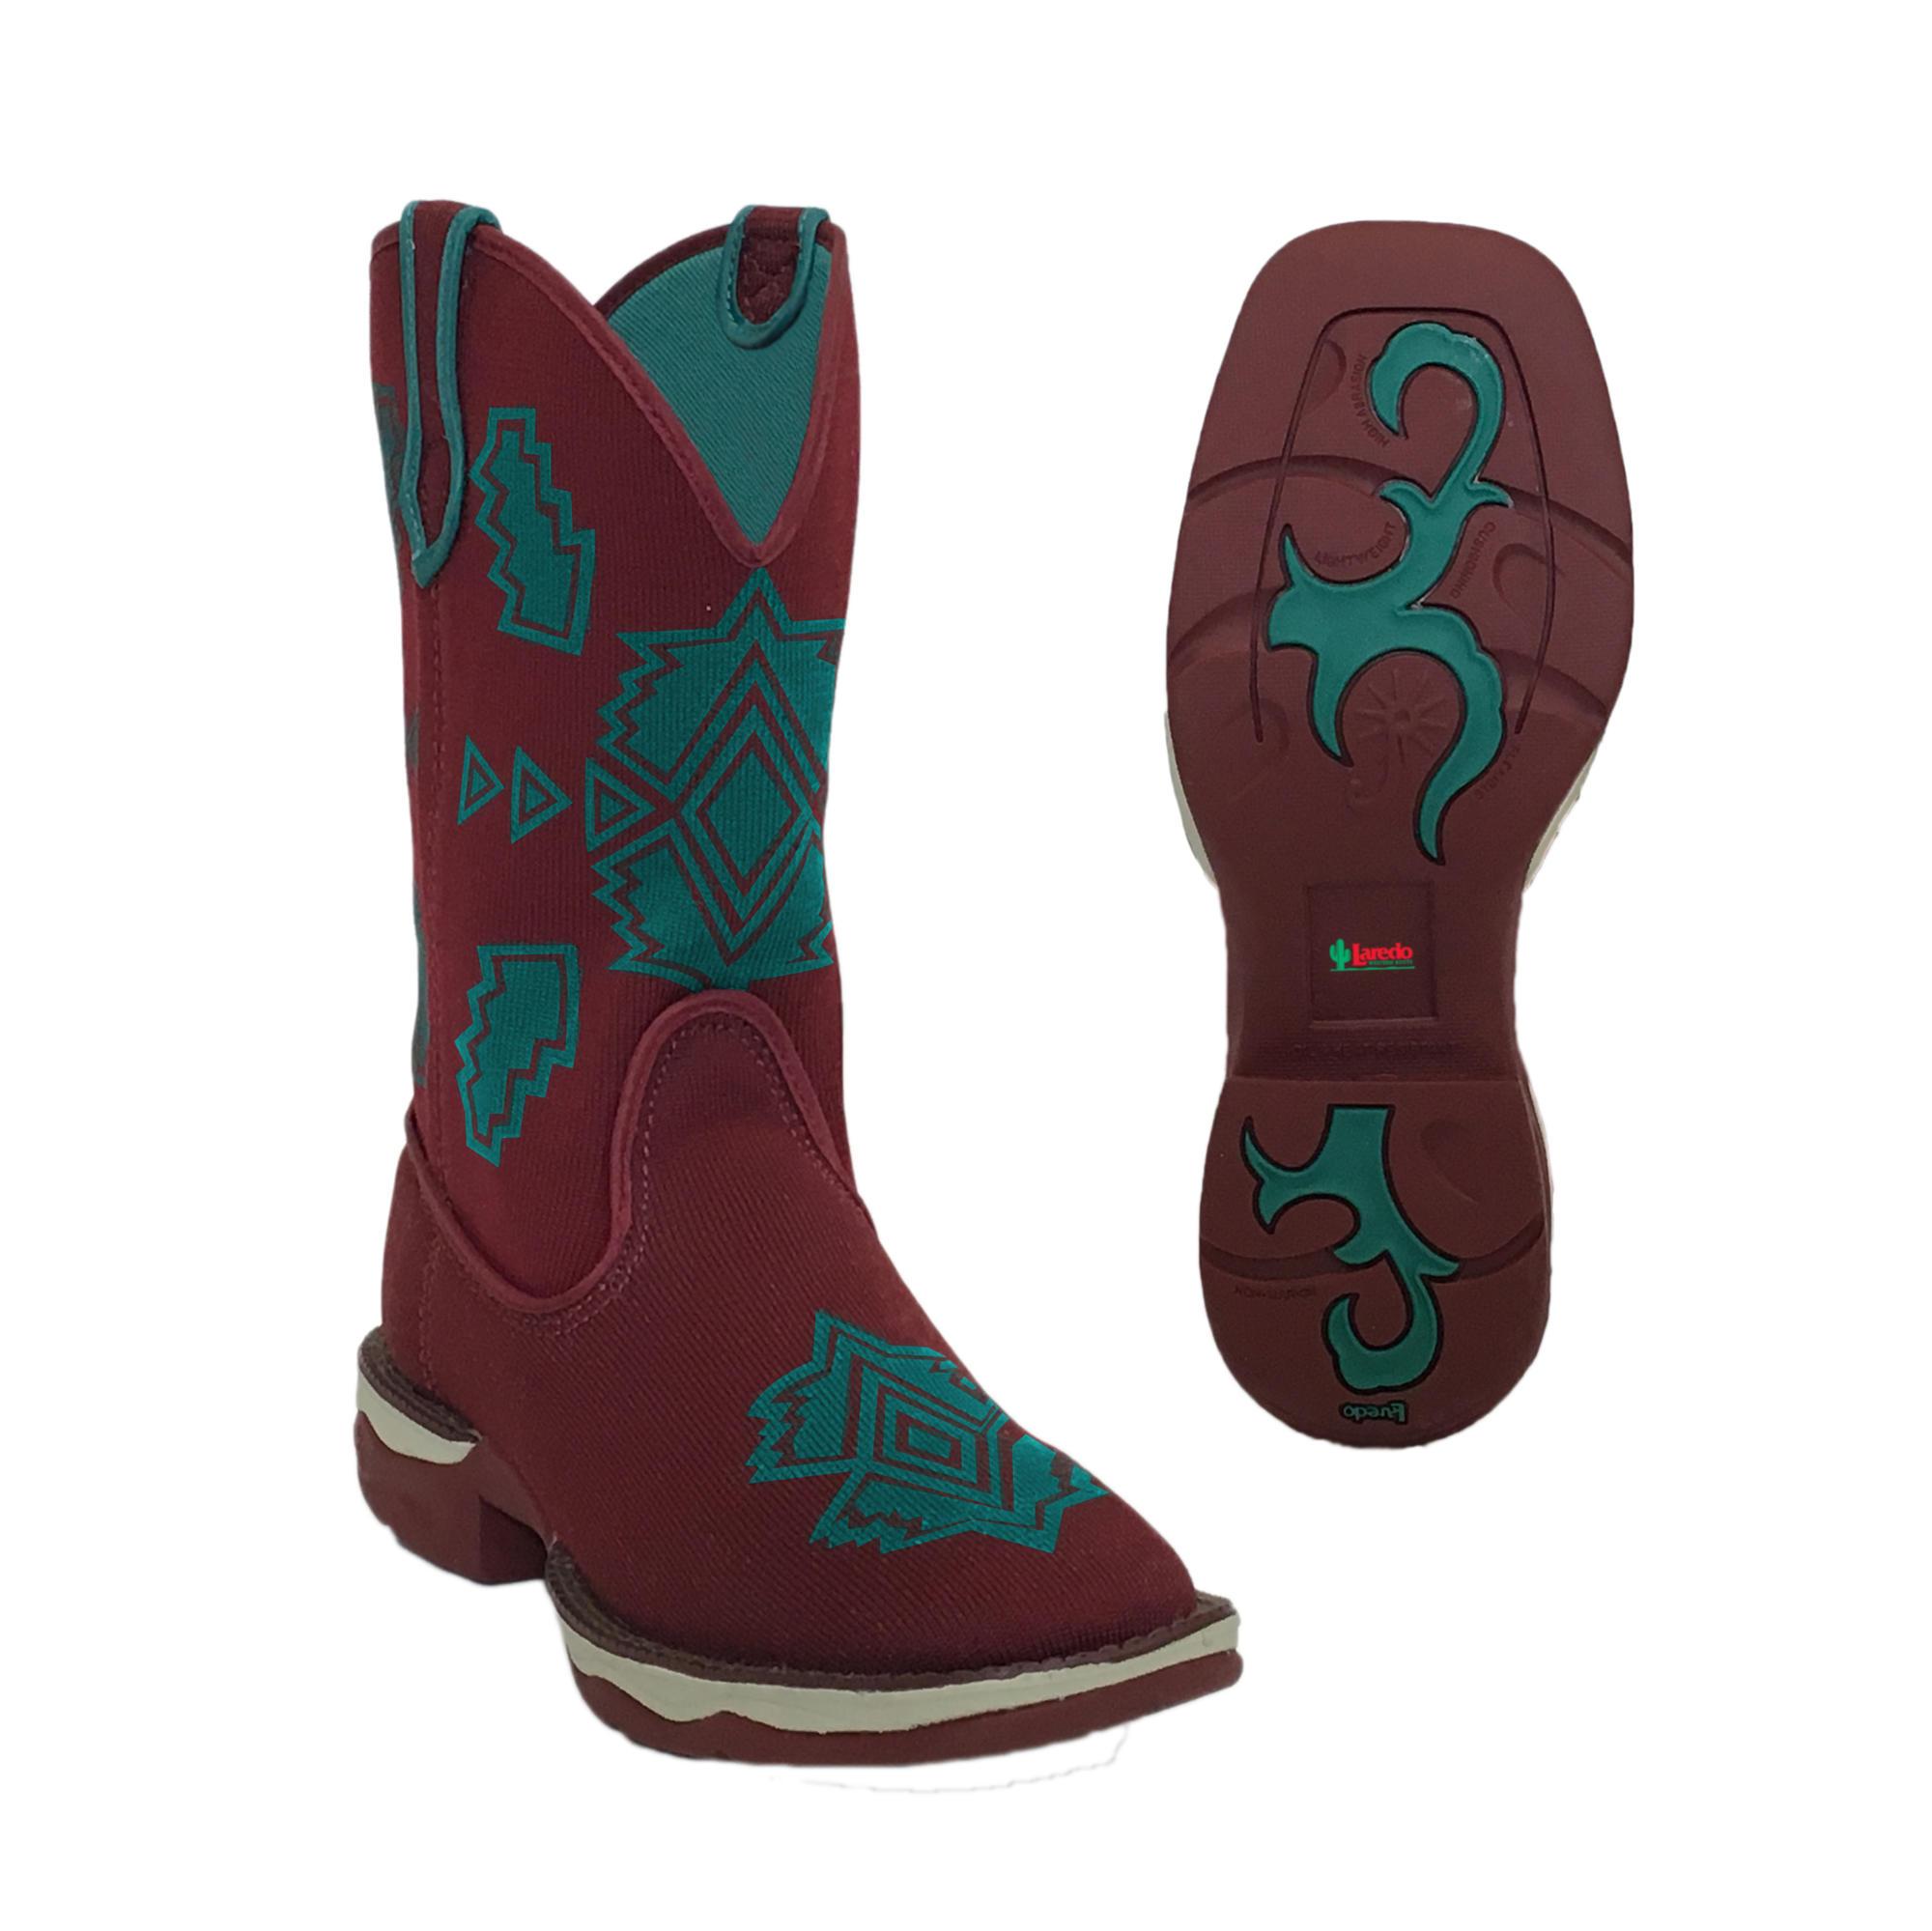 boots_laredo_5955